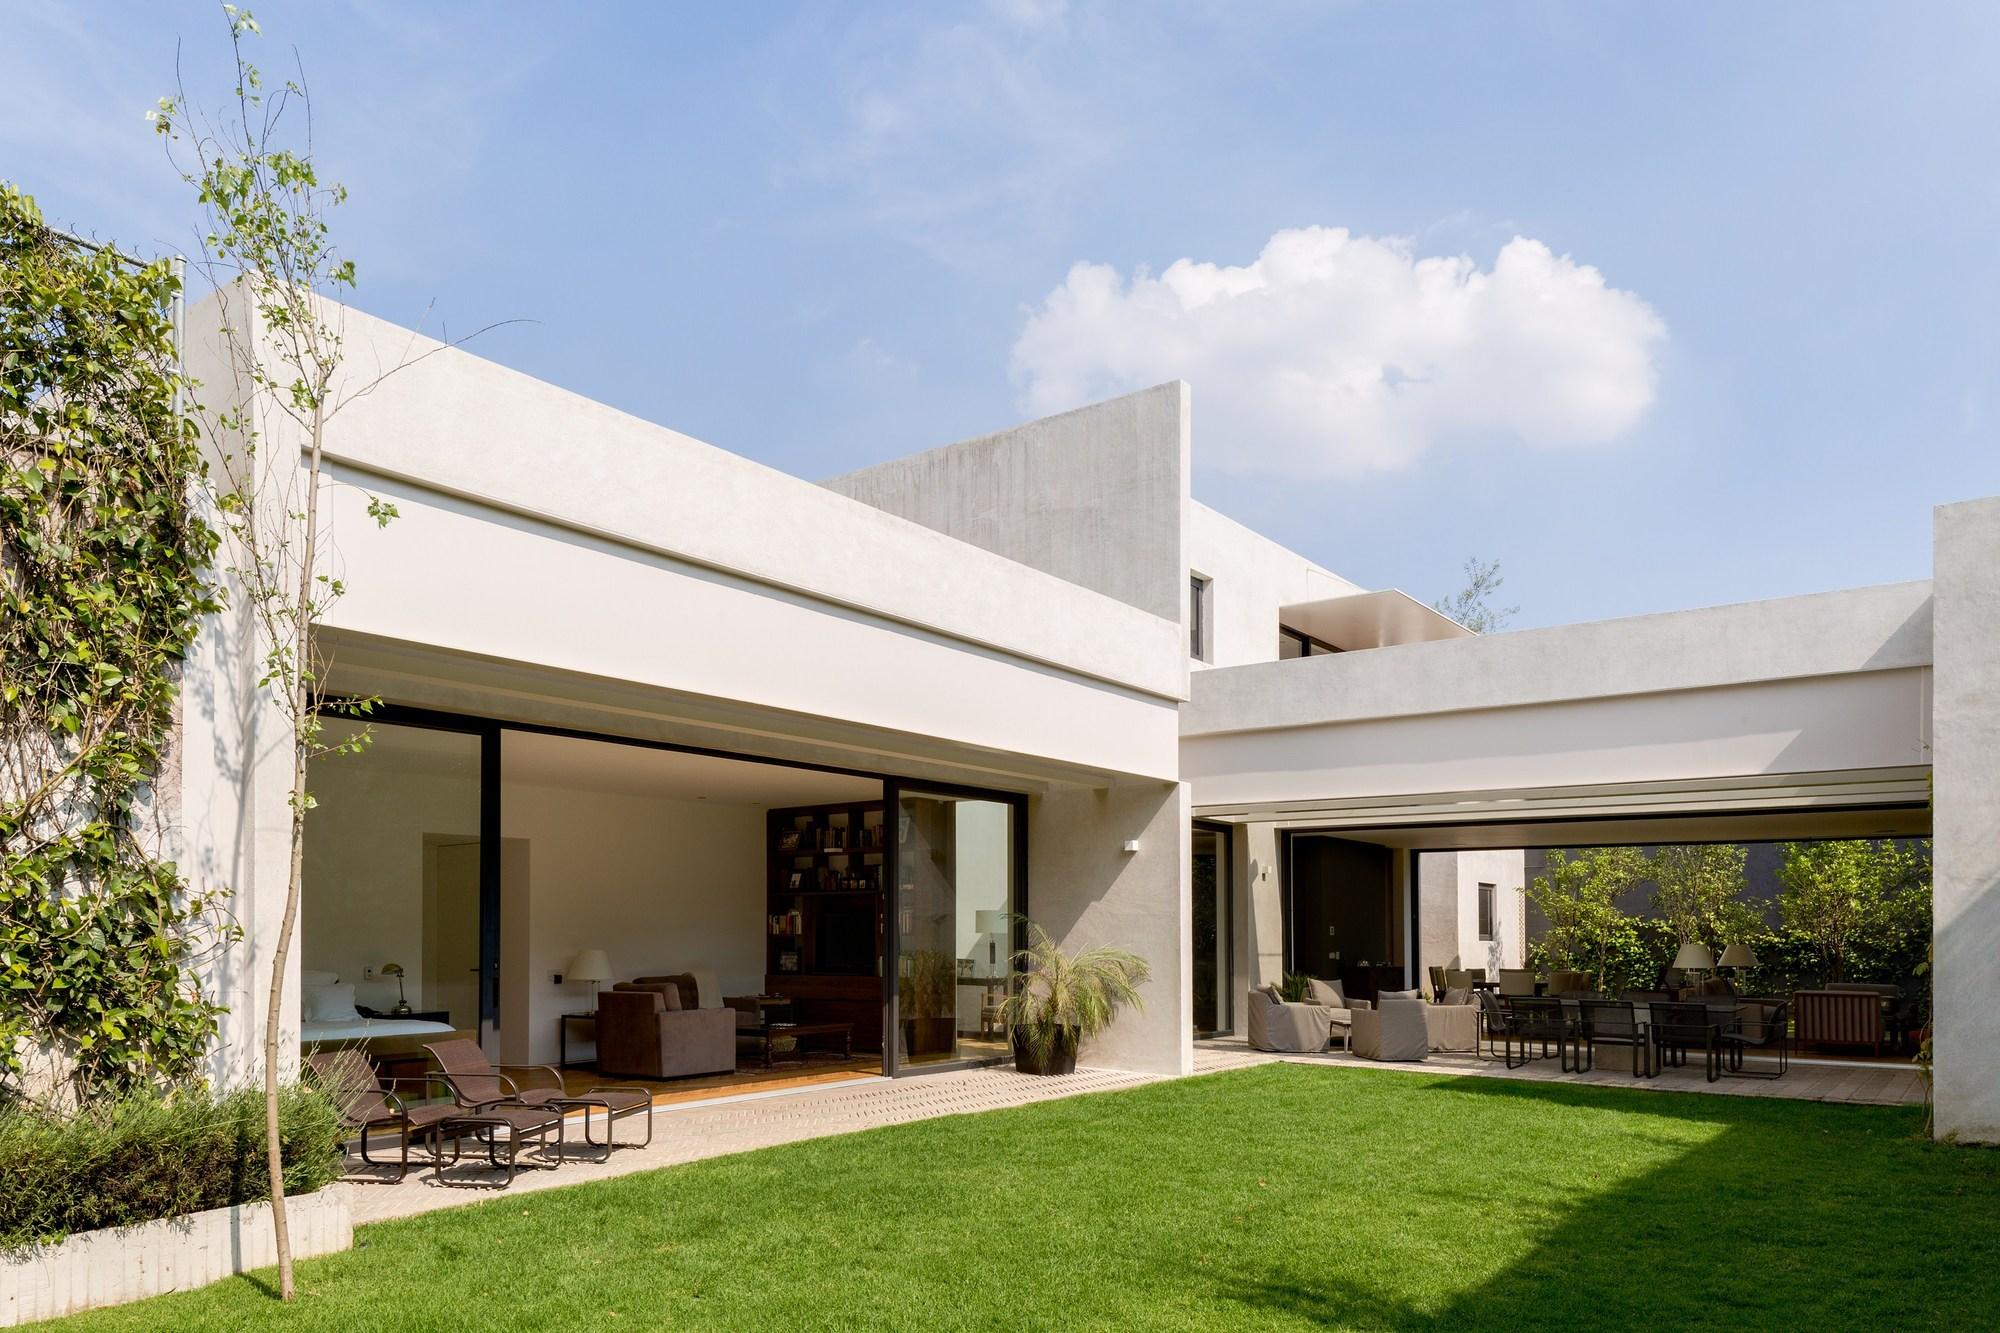 Casa jard n dcpp arquitectos archdaily m xico for Jardines exteriores de casas de campo